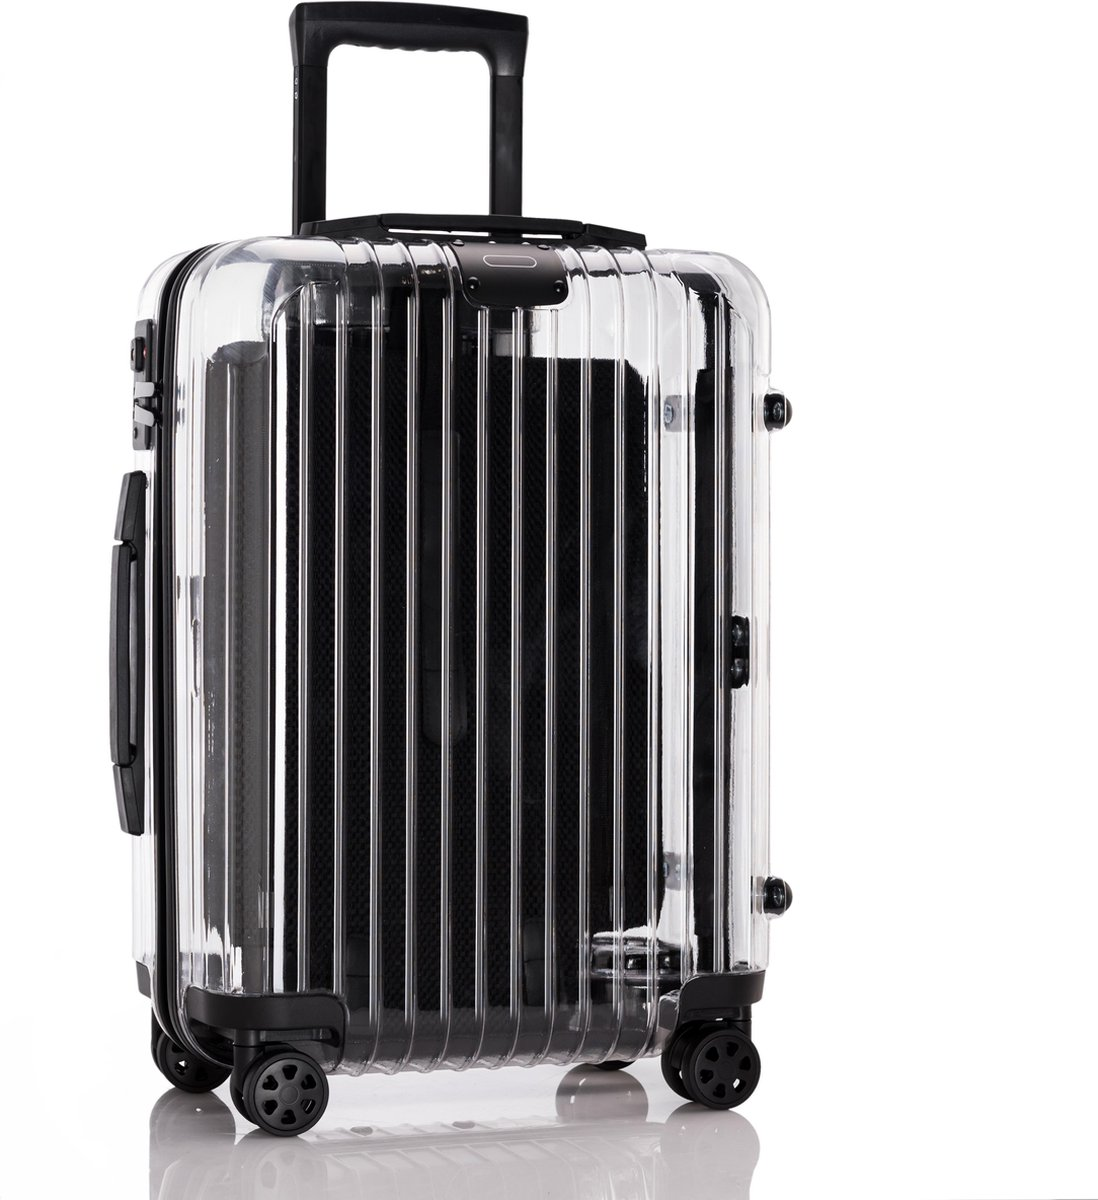 Transparante Reiskoffer 20 Inch - Stevige Doorschijnende Lichtgewicht Trolley - Modern en Hippe Valies - TSA Slot - 4 Zwenkbare Wielen - Kwaliteitsvolle Materialen - 50 Cm - 44 Liter kopen